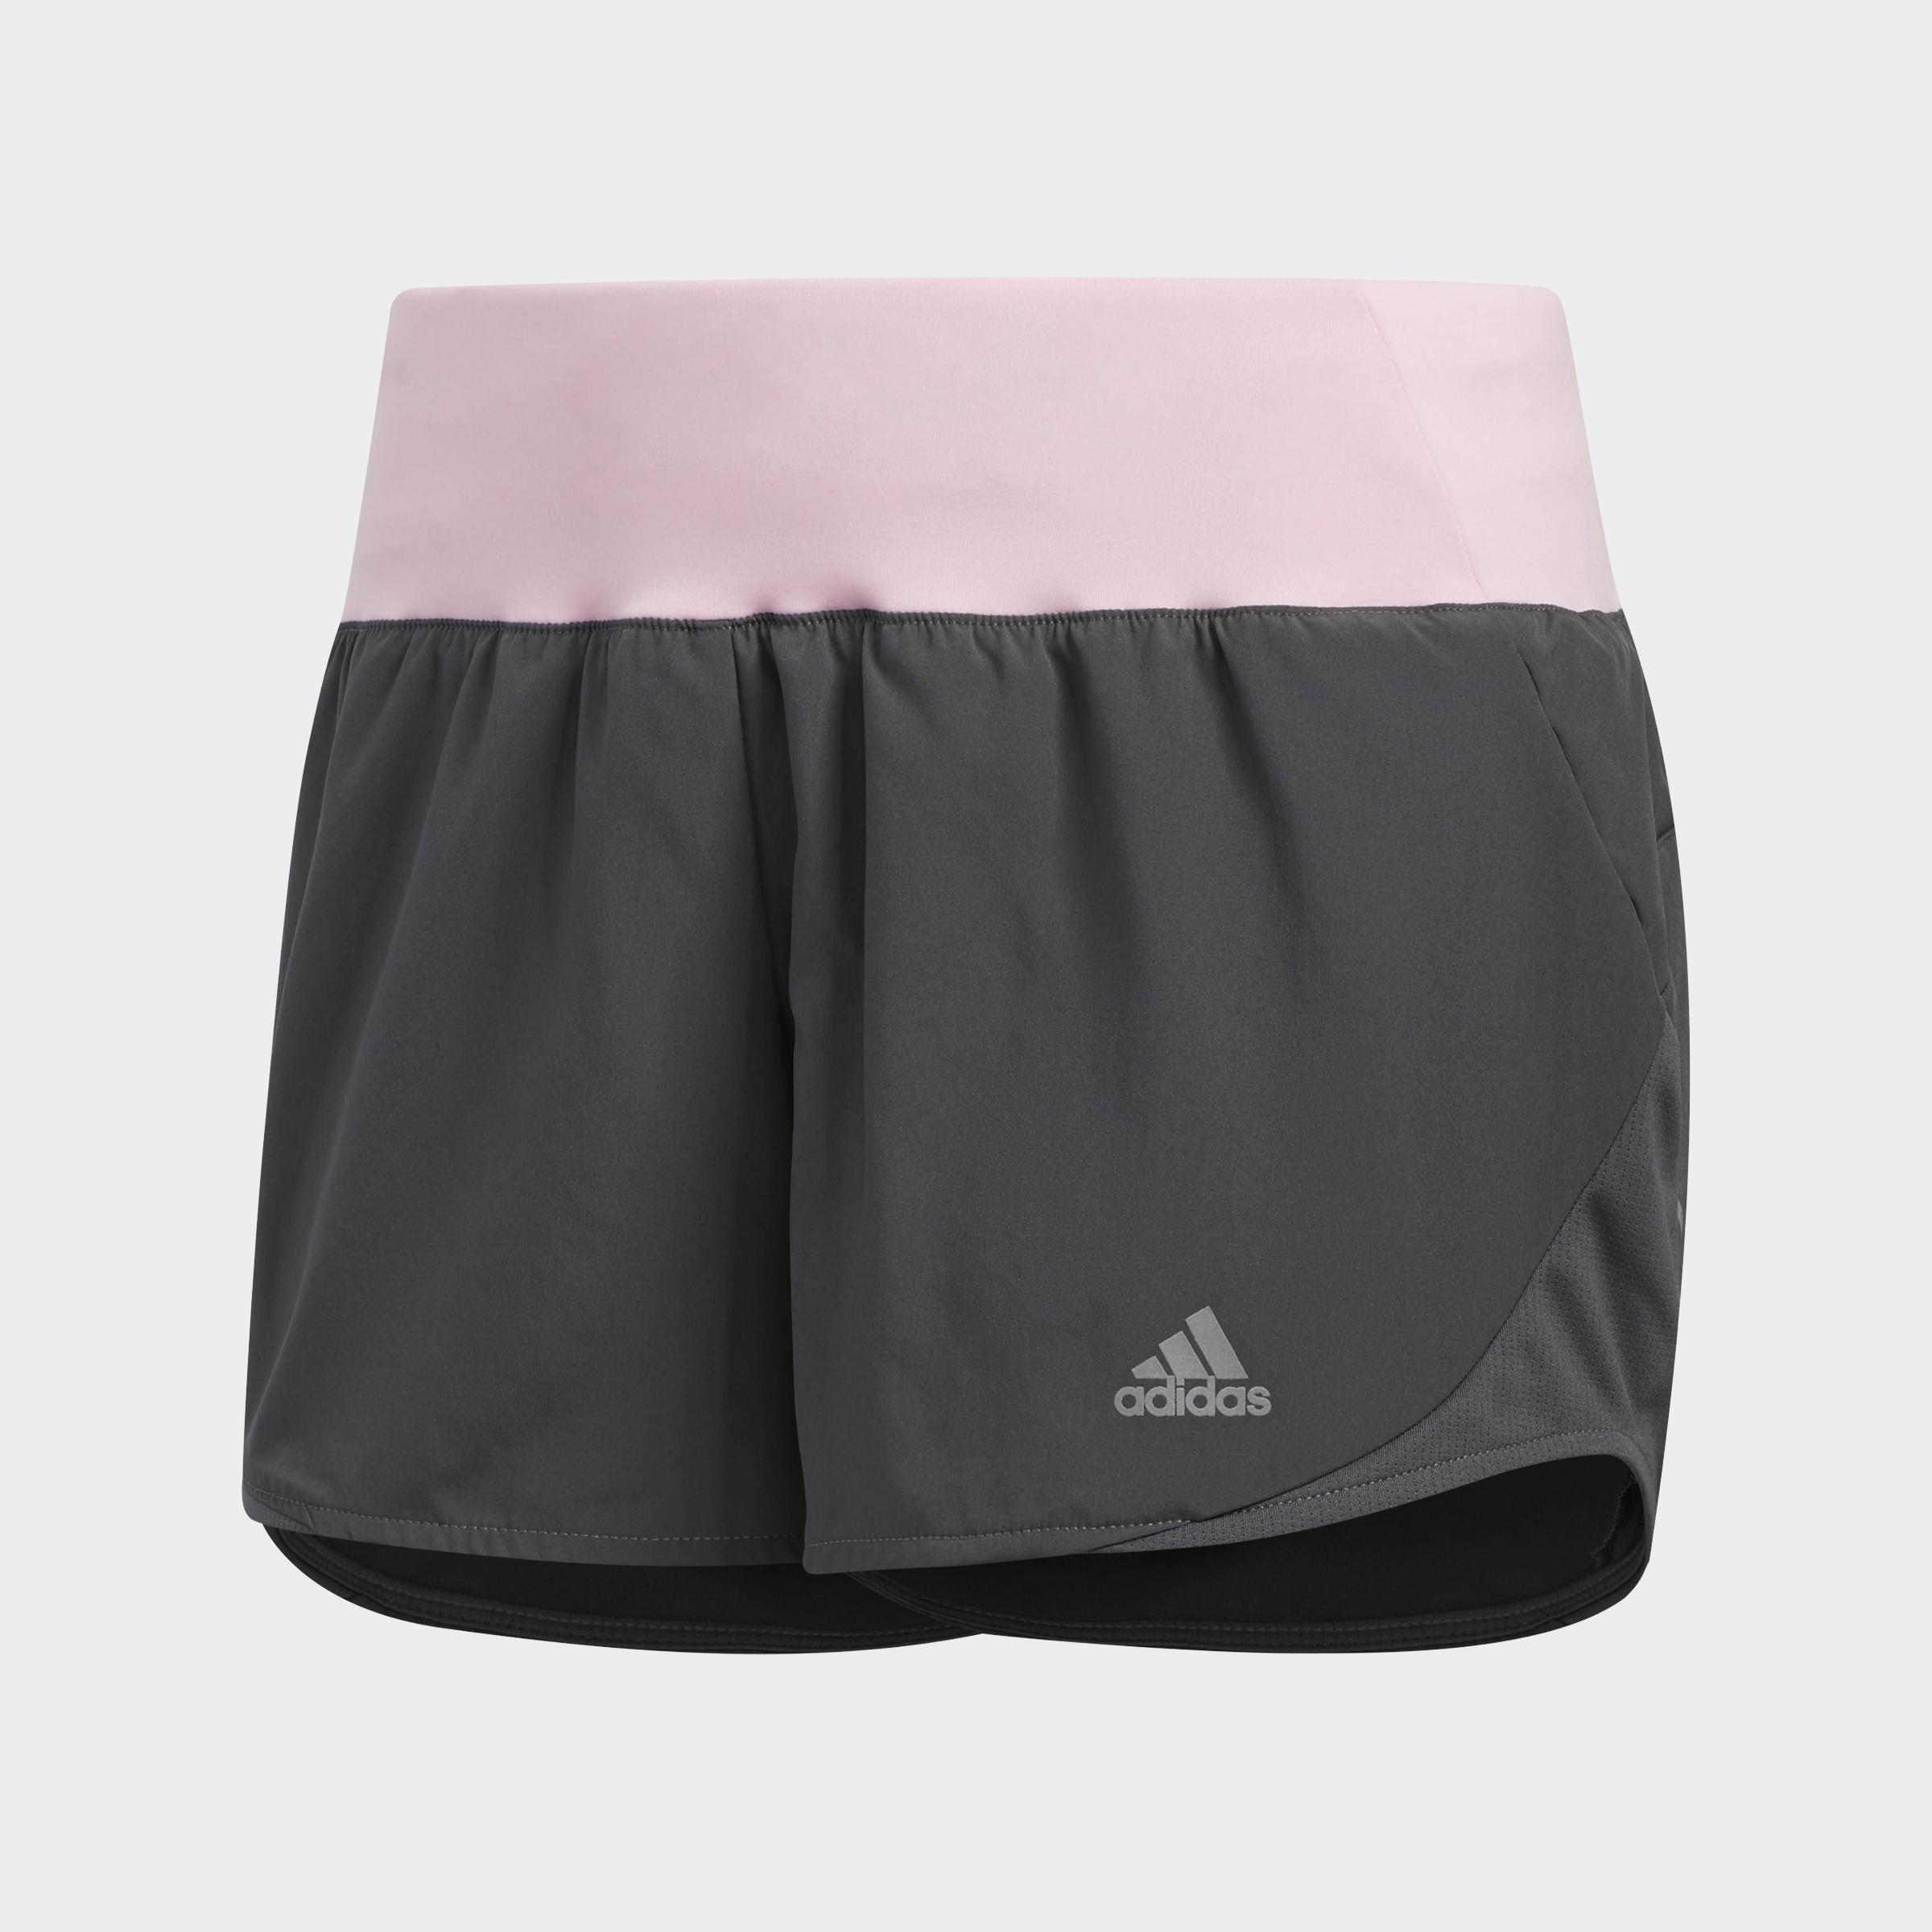 adidas-Run-It-Shorts-Women-039-s-Shorts thumbnail 17